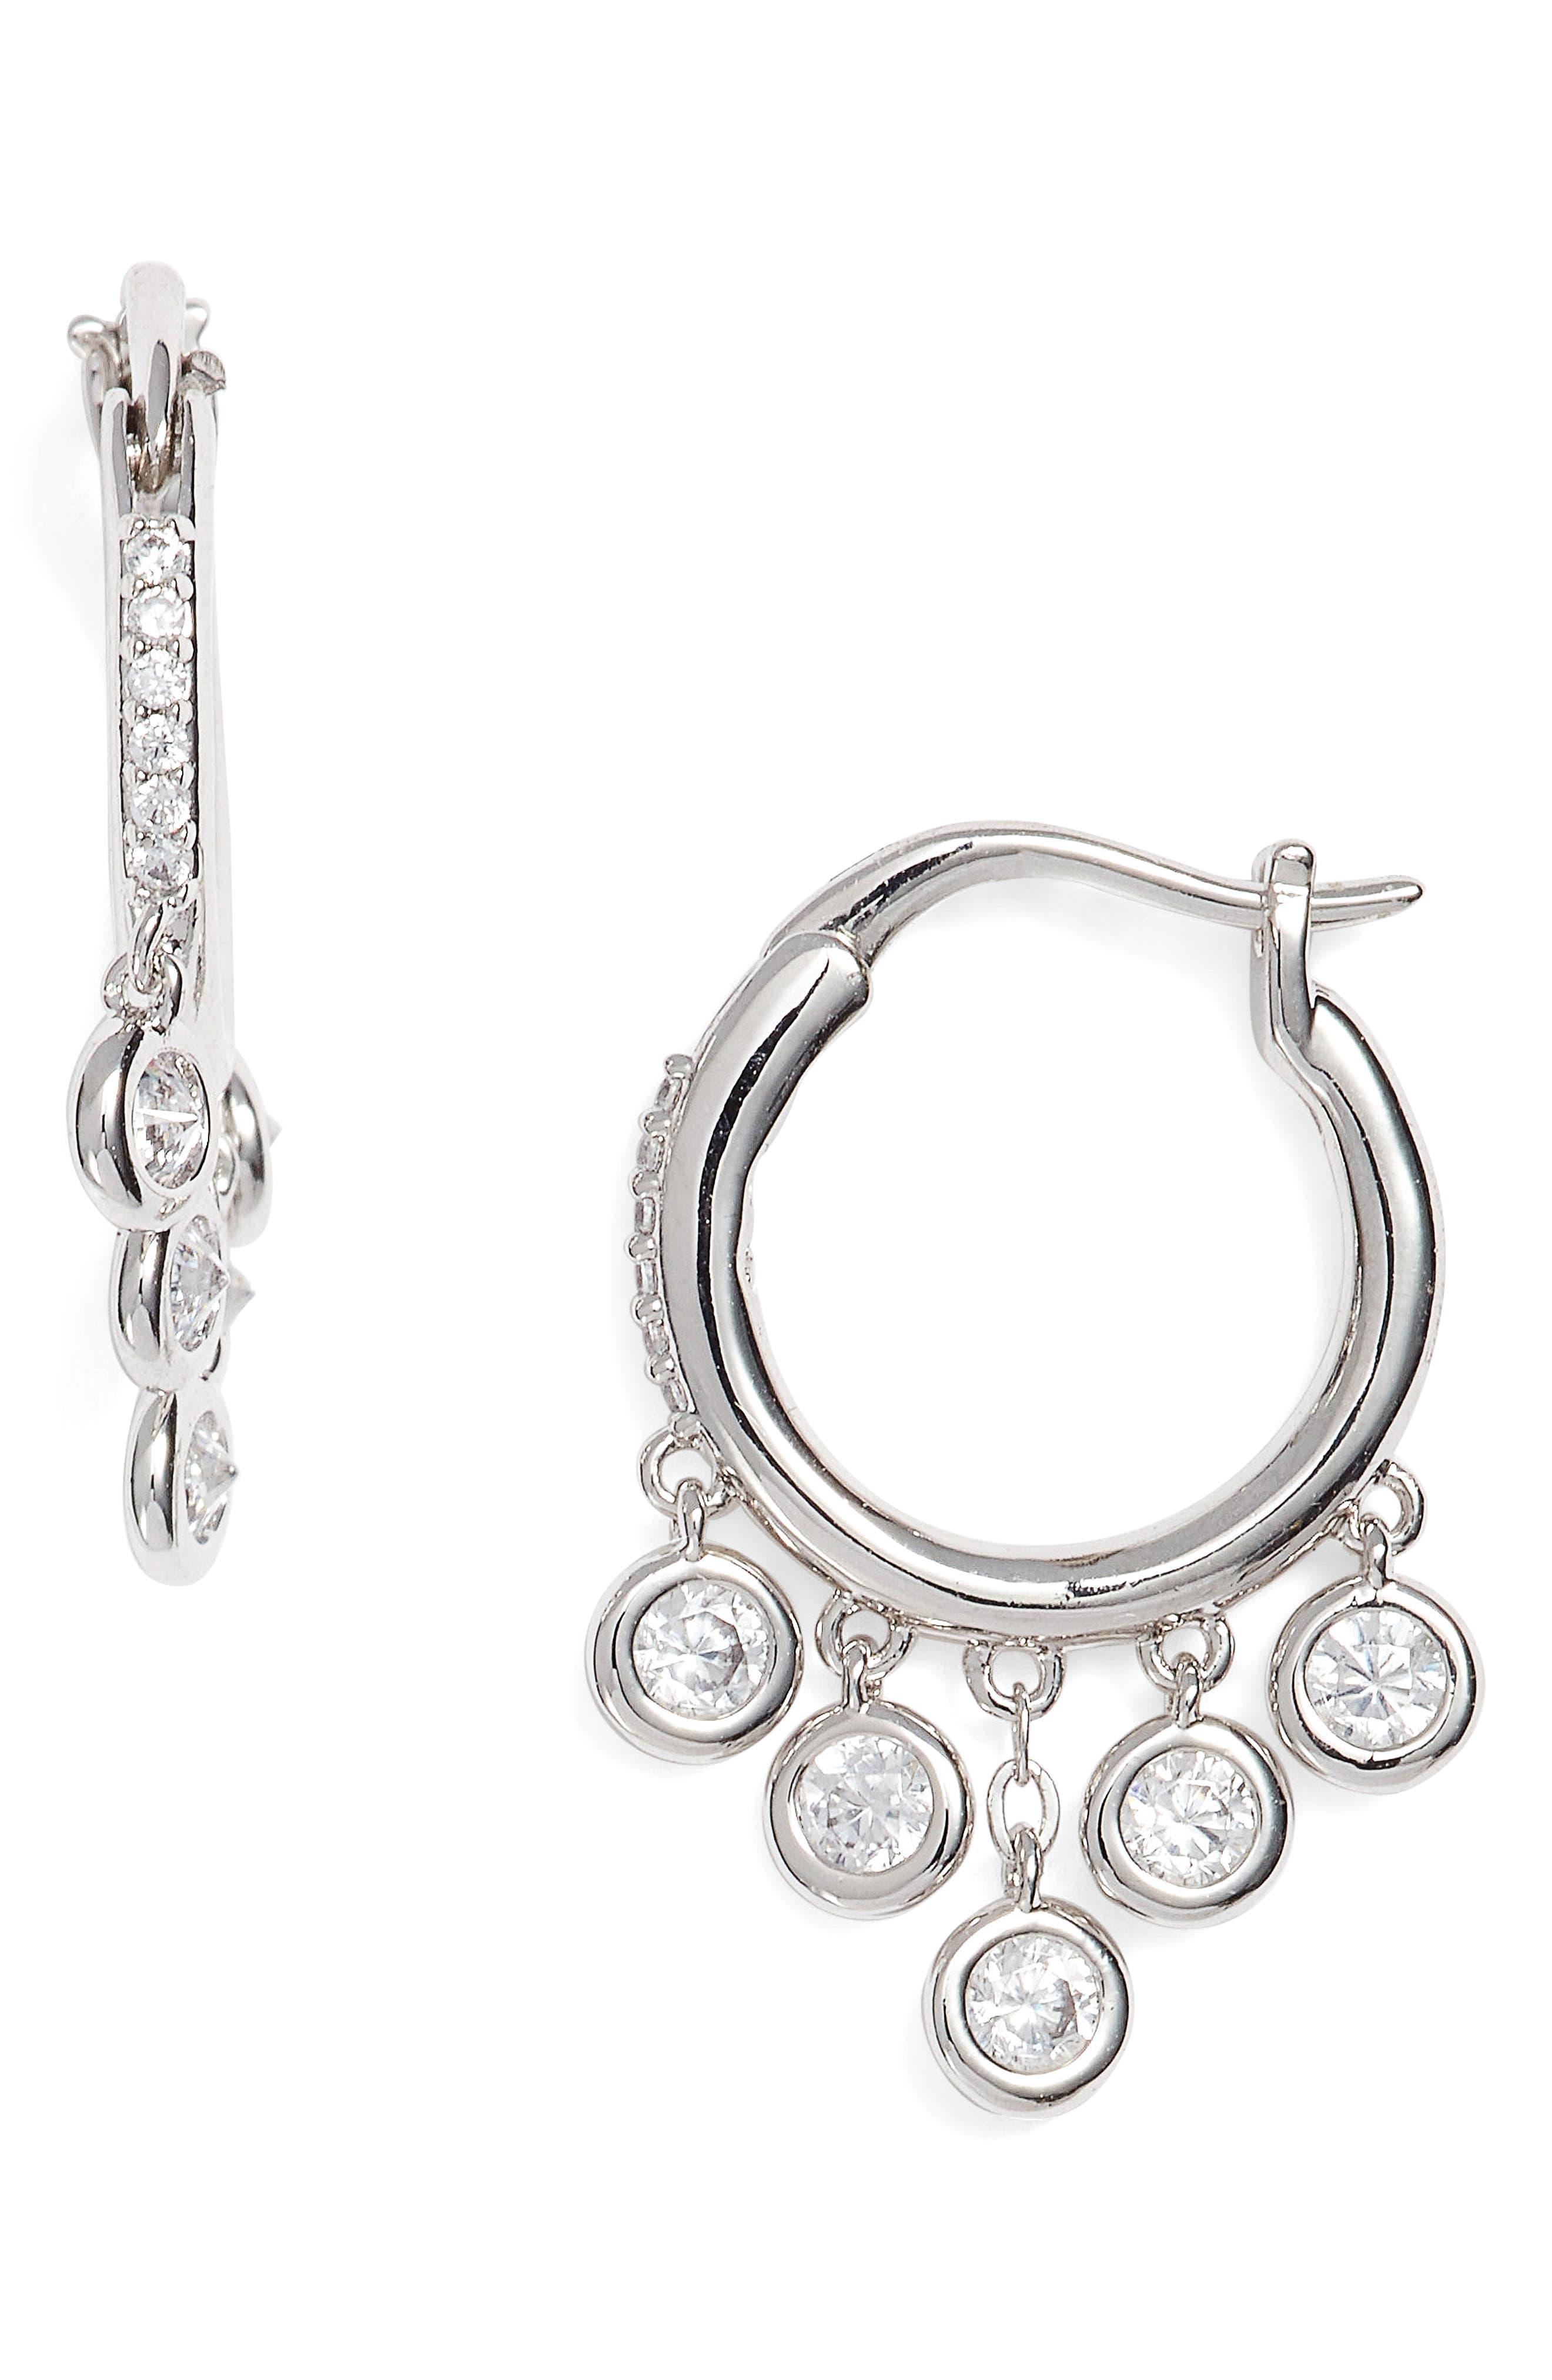 Cubic Zirconia Hoop Earrings,                             Main thumbnail 1, color,                             040